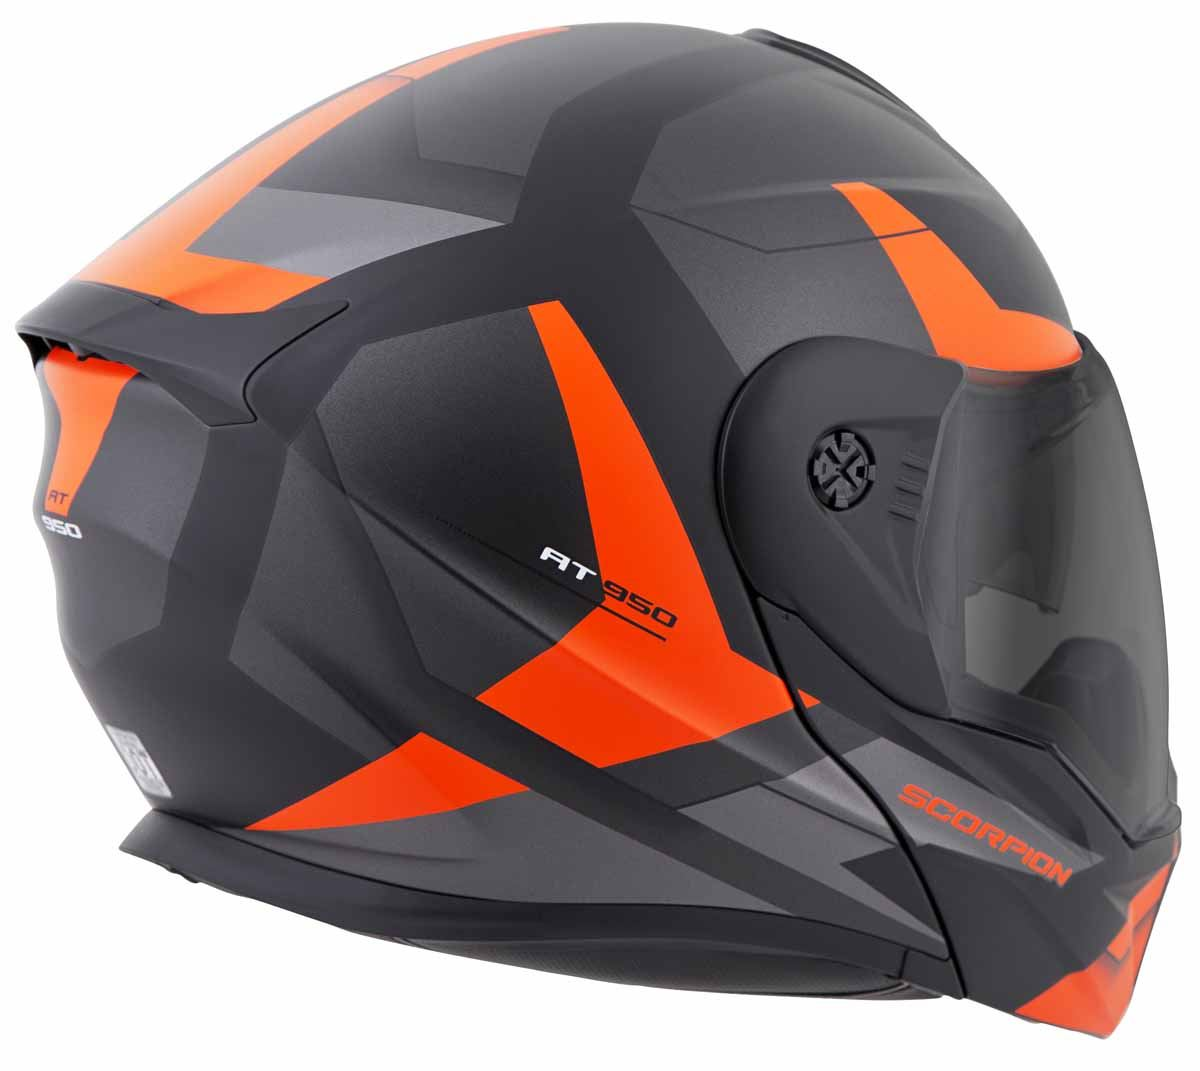 Scorpion-EXO-AT950-Helmet-Flip-Up-Modular-Dual-Sport-Adventure-ADV-DOT-XS-3XL miniature 52